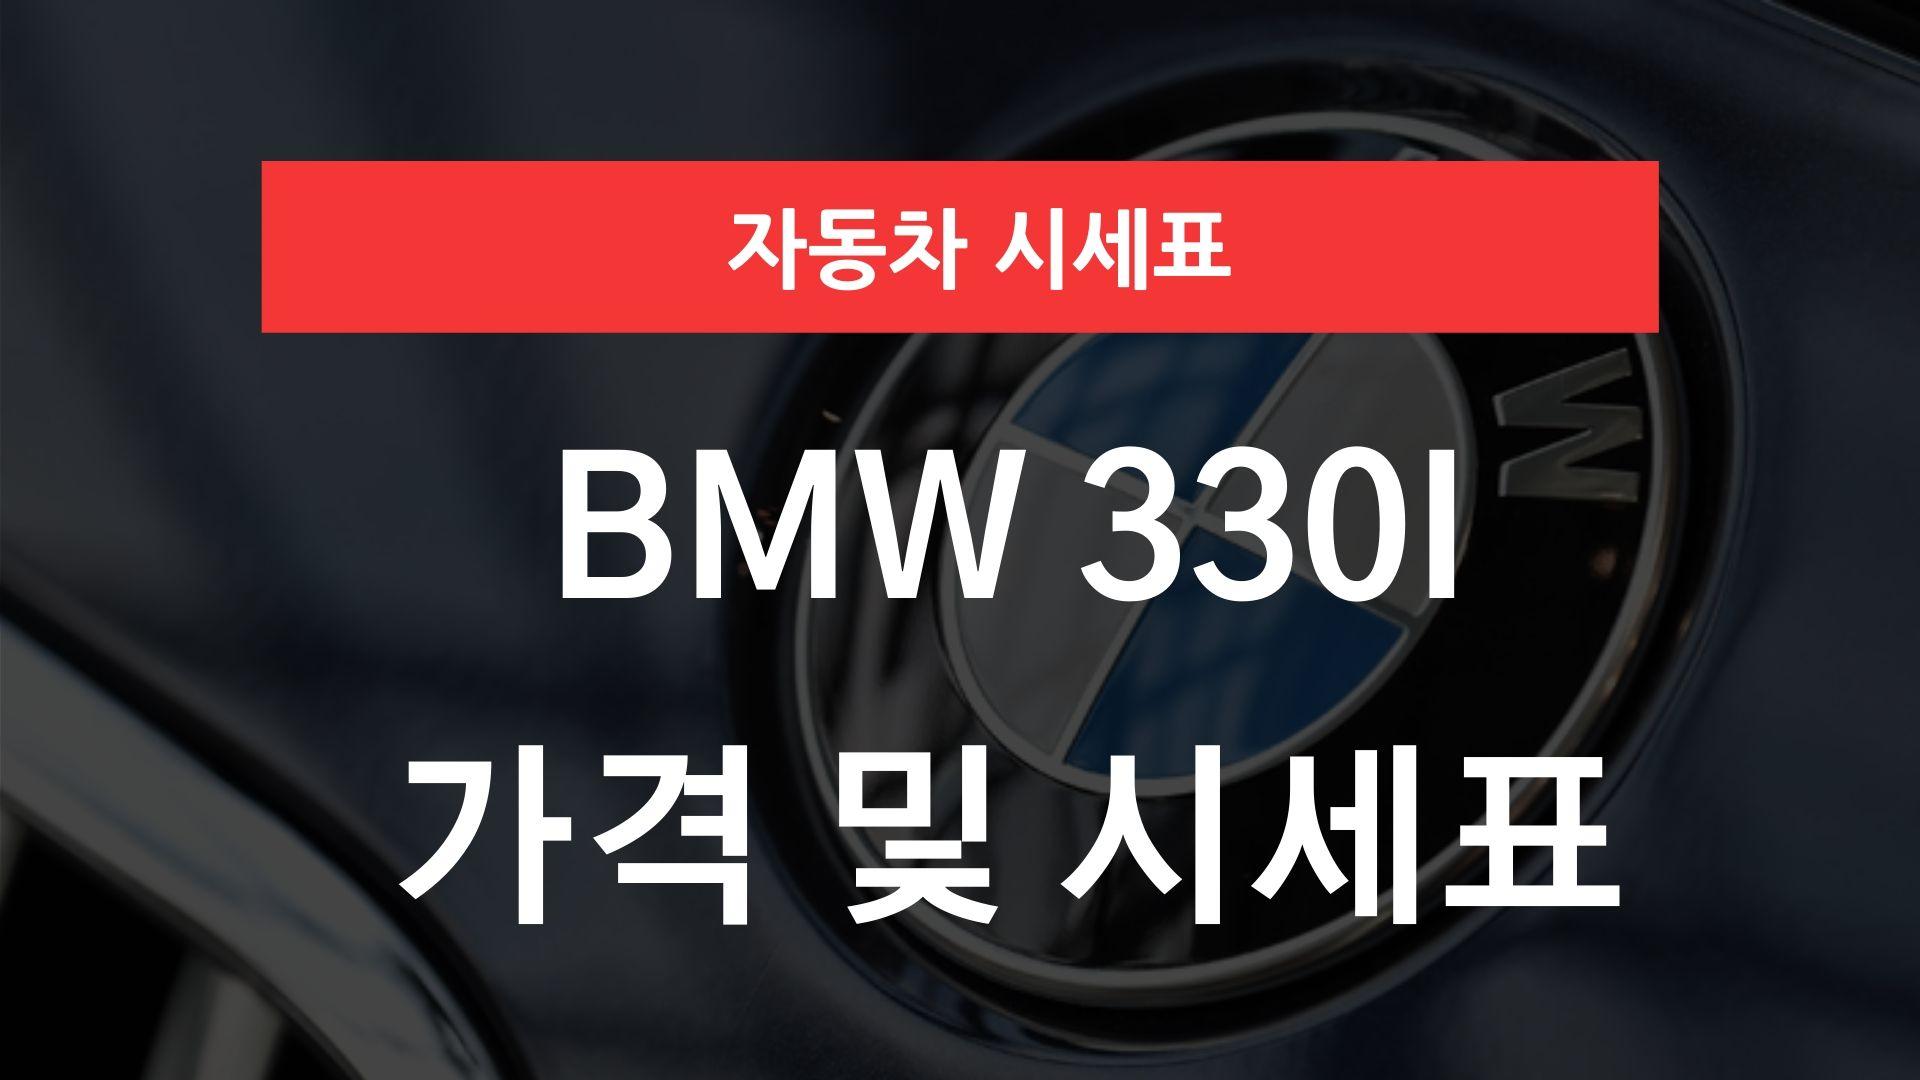 BMW 330i 가격